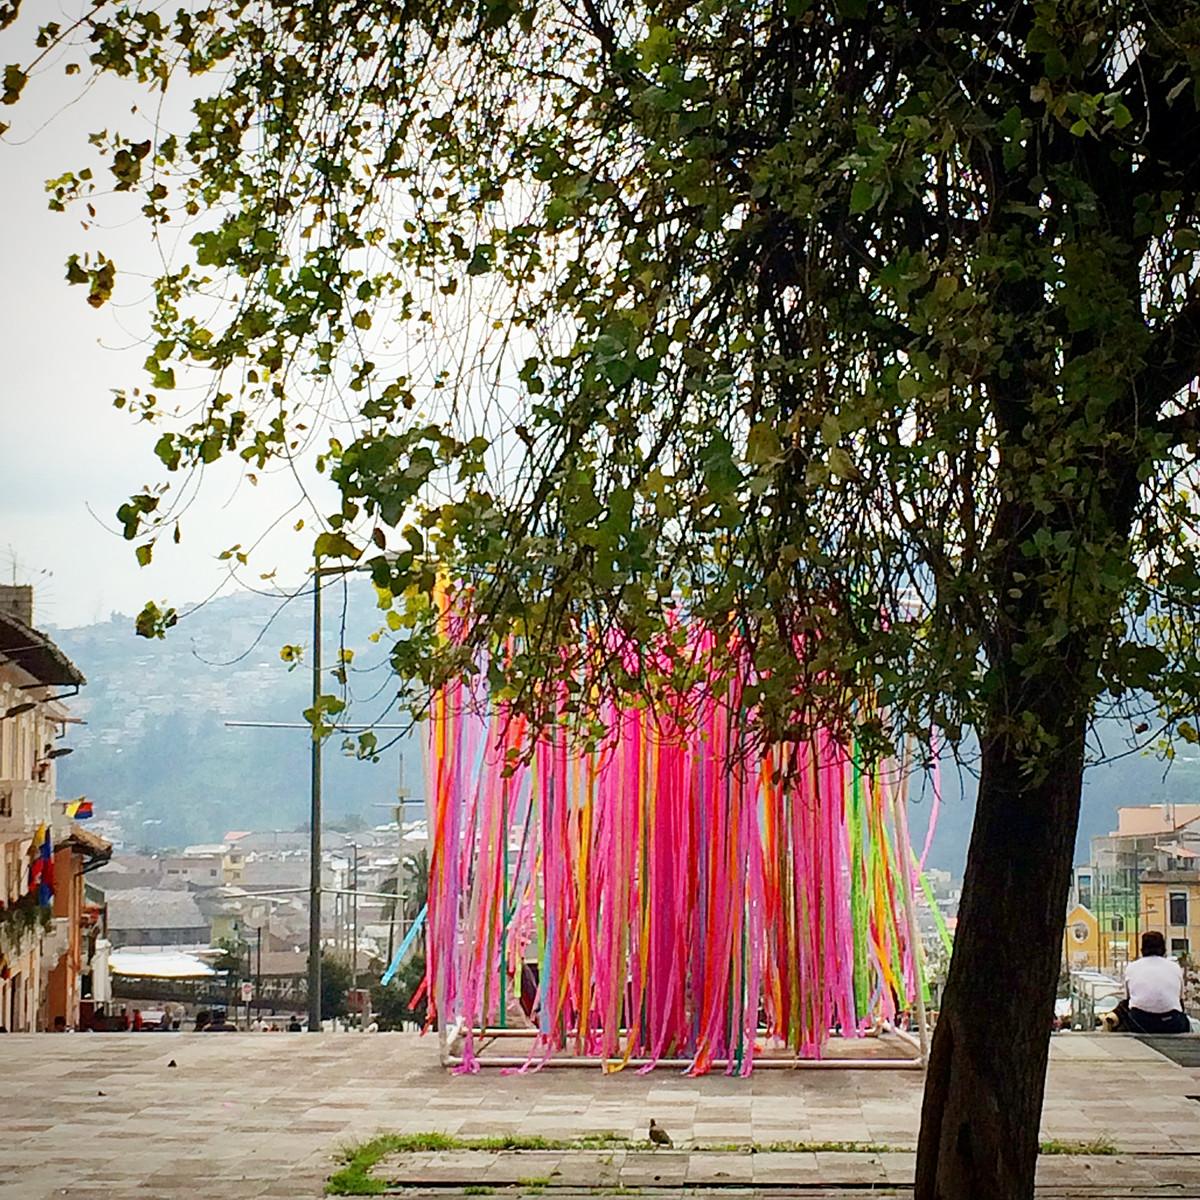 El Cubo. Image Cortesia de XIX Bienal Panamericana de Arquitectura Quito